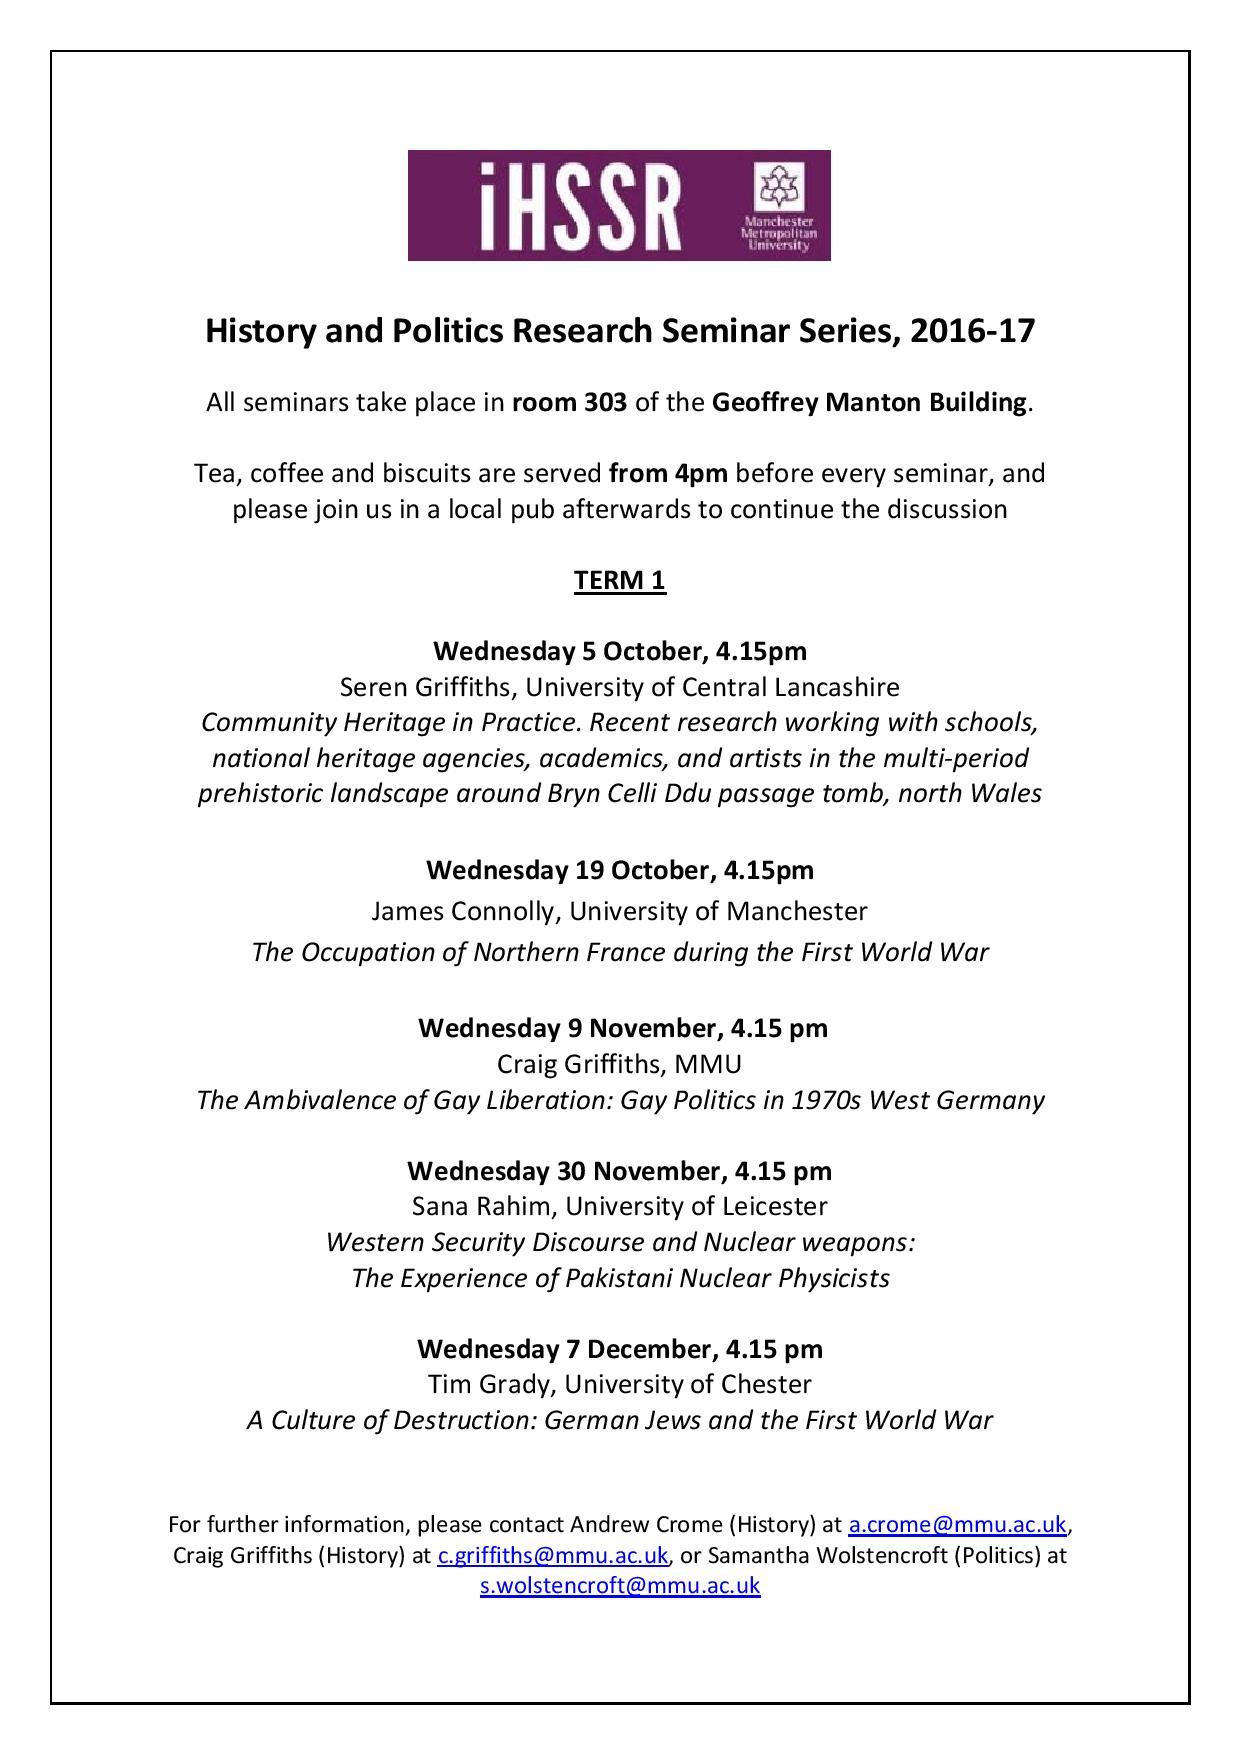 2016-17-hpp-research-seminar-series-programme-term-1-page-001